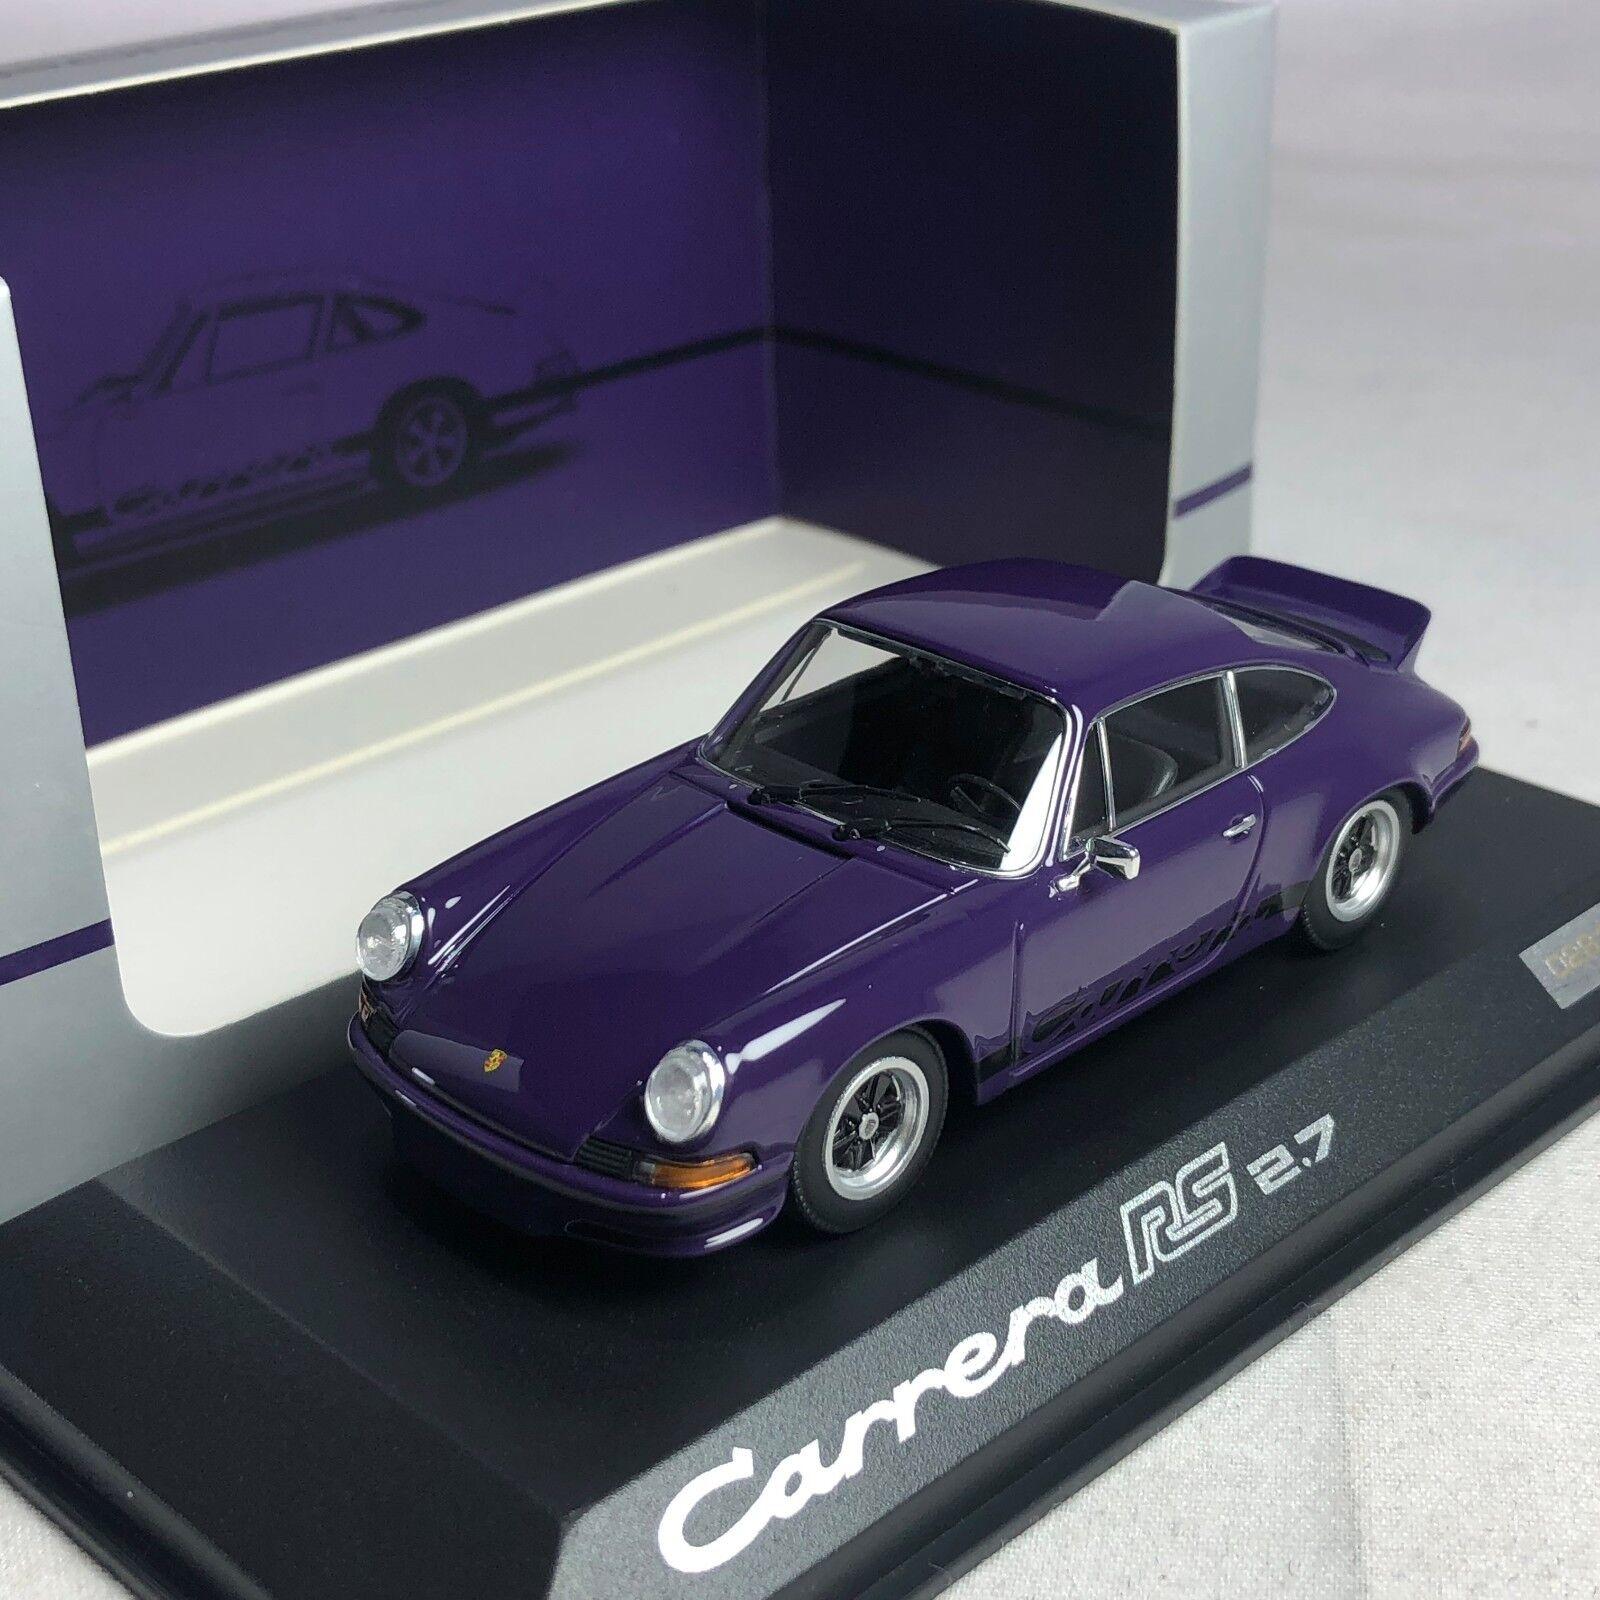 1 43 Minichamps Porsche Carrera RS 2.7 Purple Dealer Version WAP0201430J